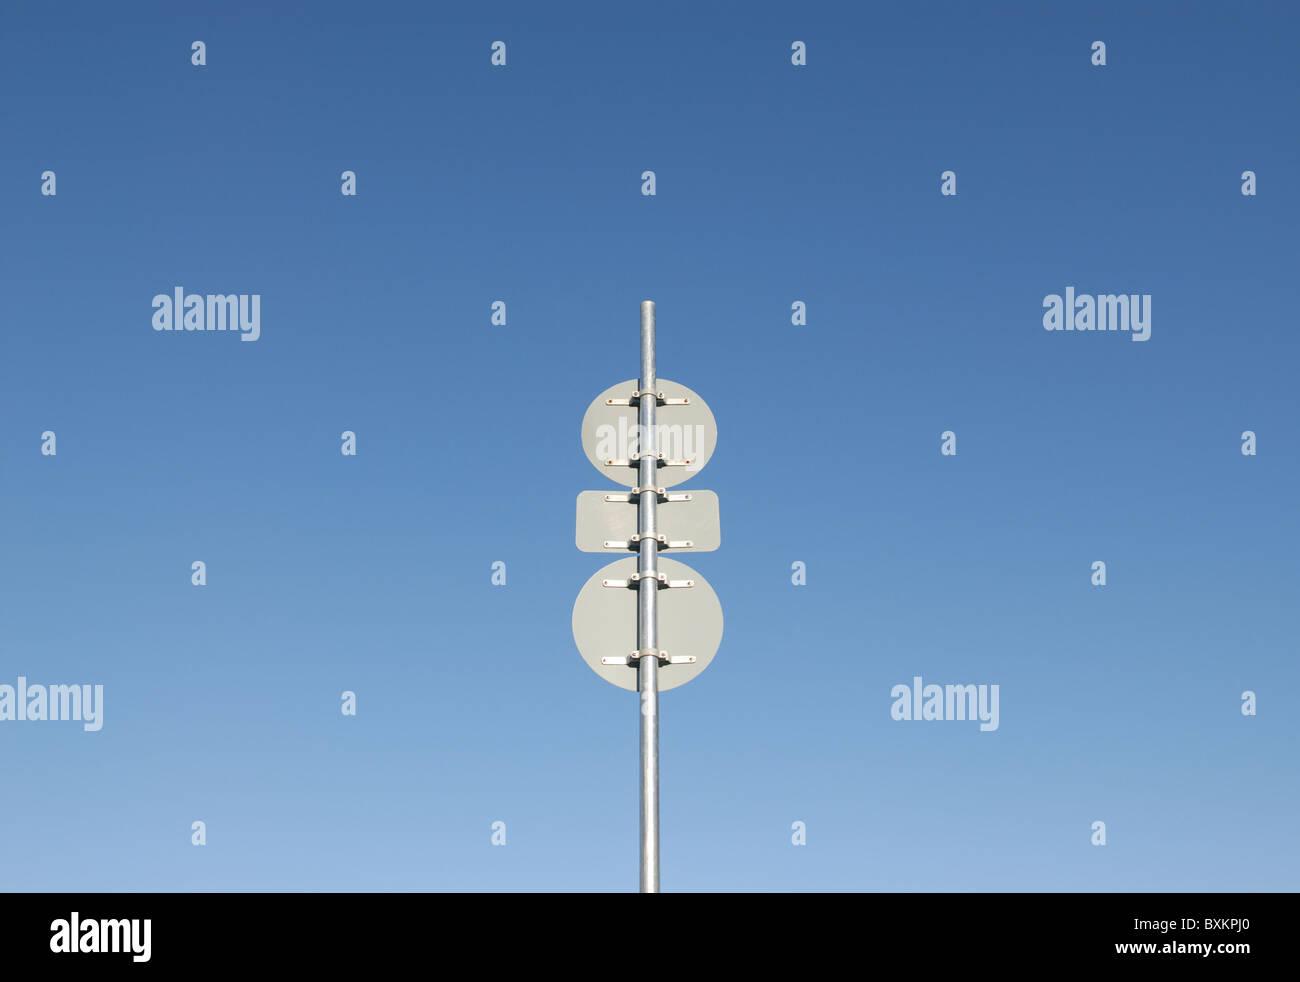 THREE SIGNS - Stock Image